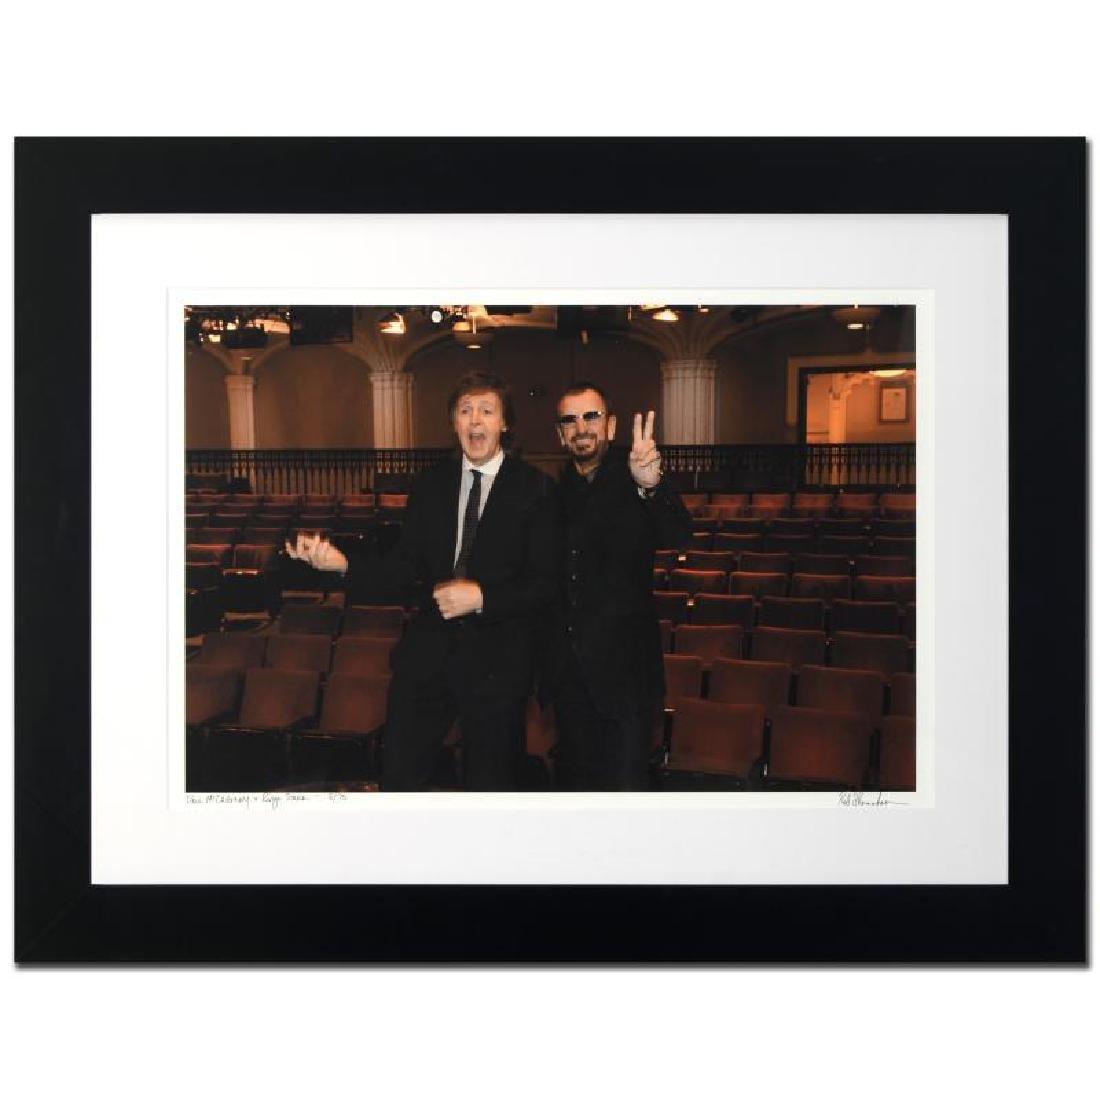 """Paul McCartney & Ringo Starr"" Limited Edition Giclee - 3"